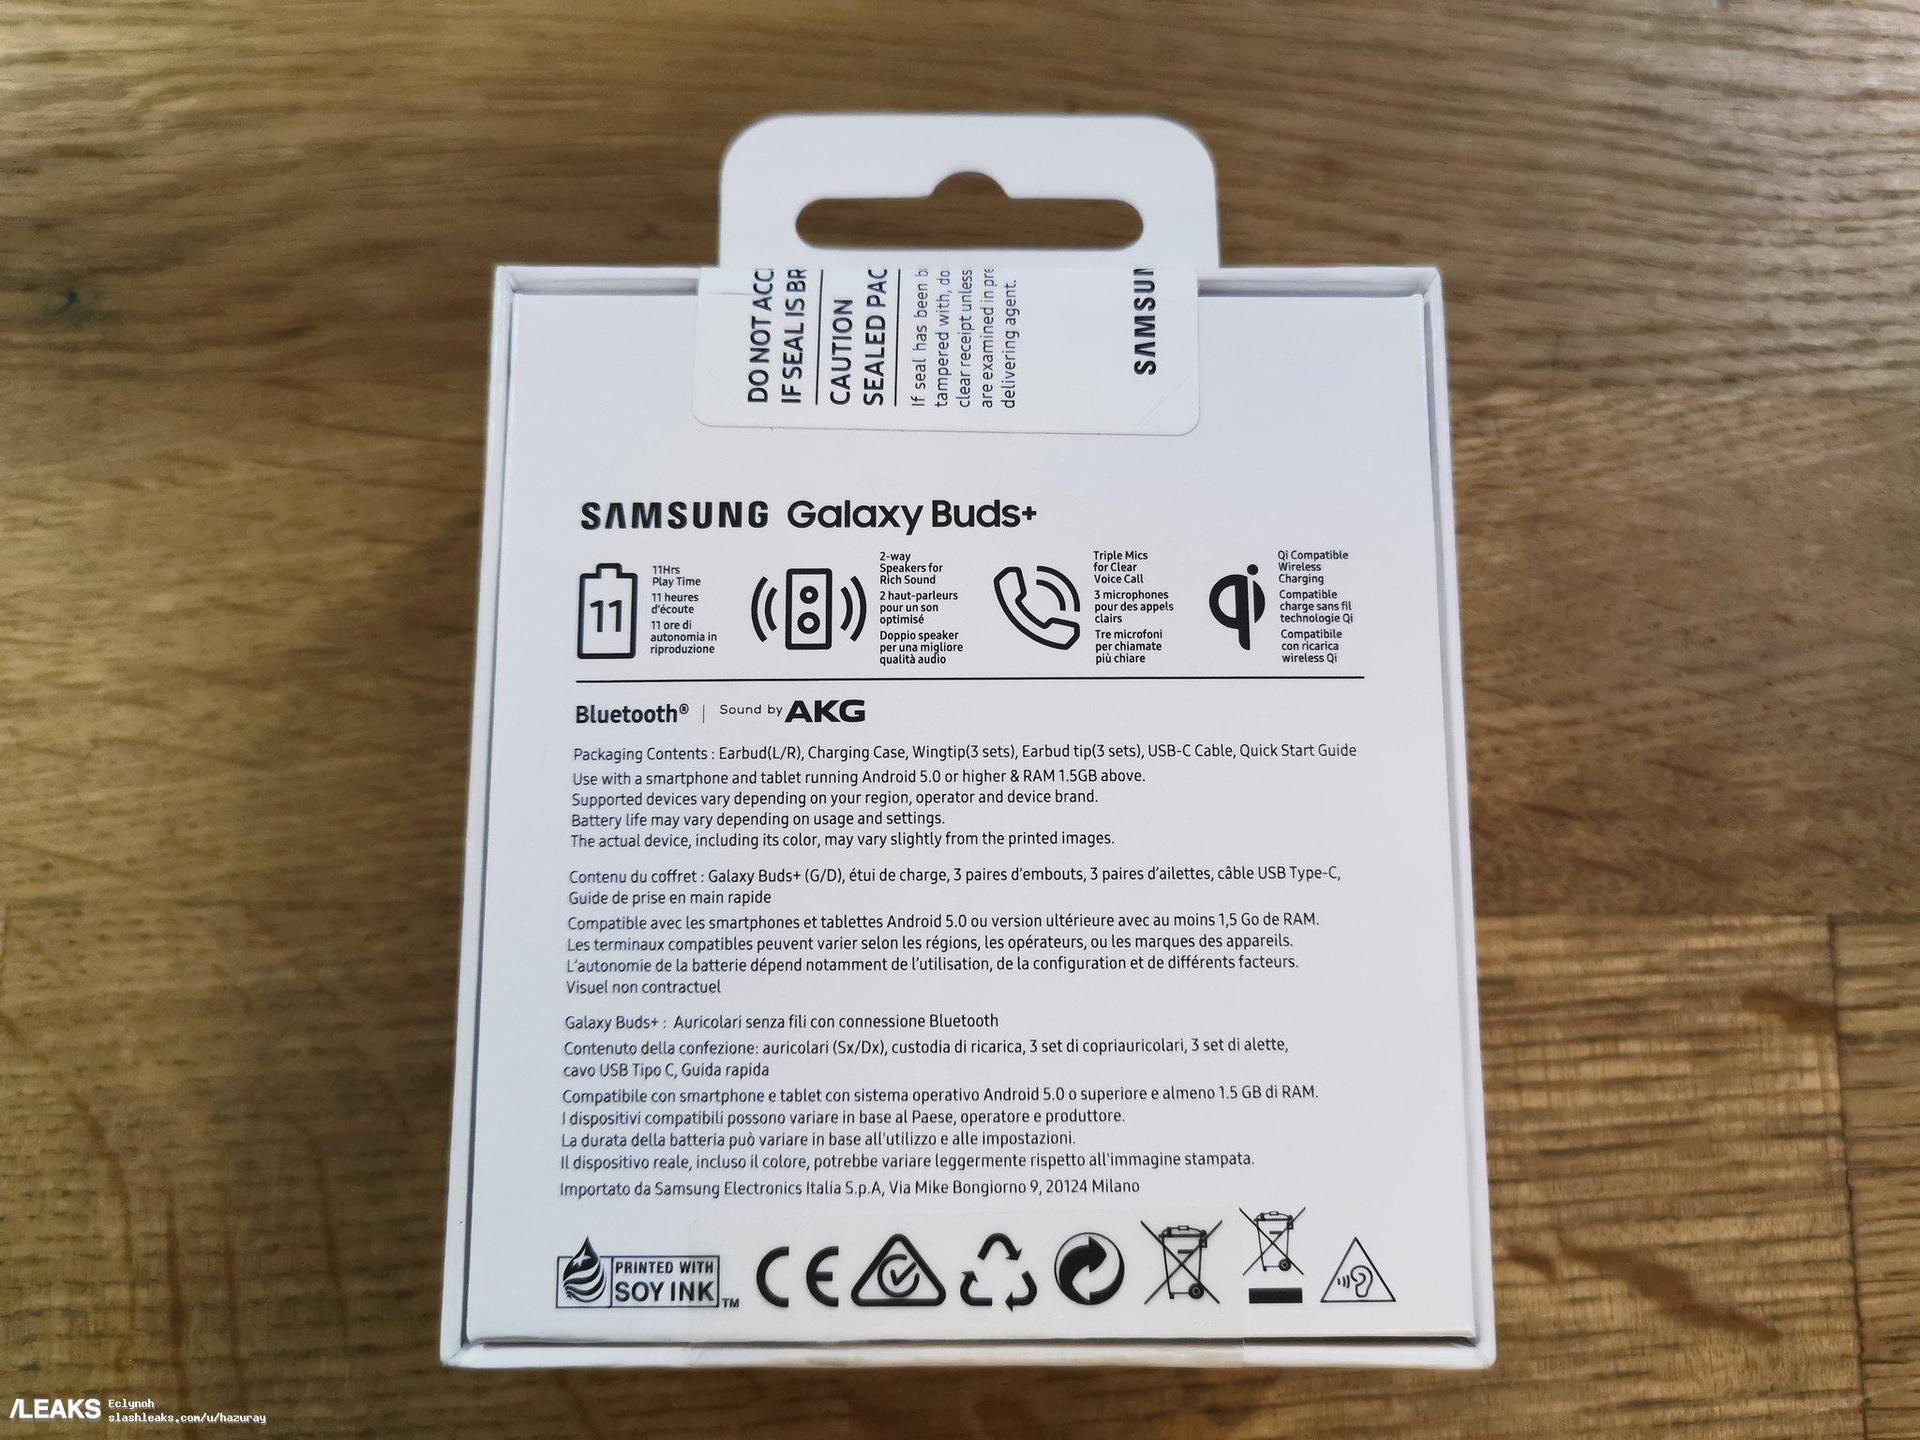 Samsung Galaxy Buds Plus retail box back